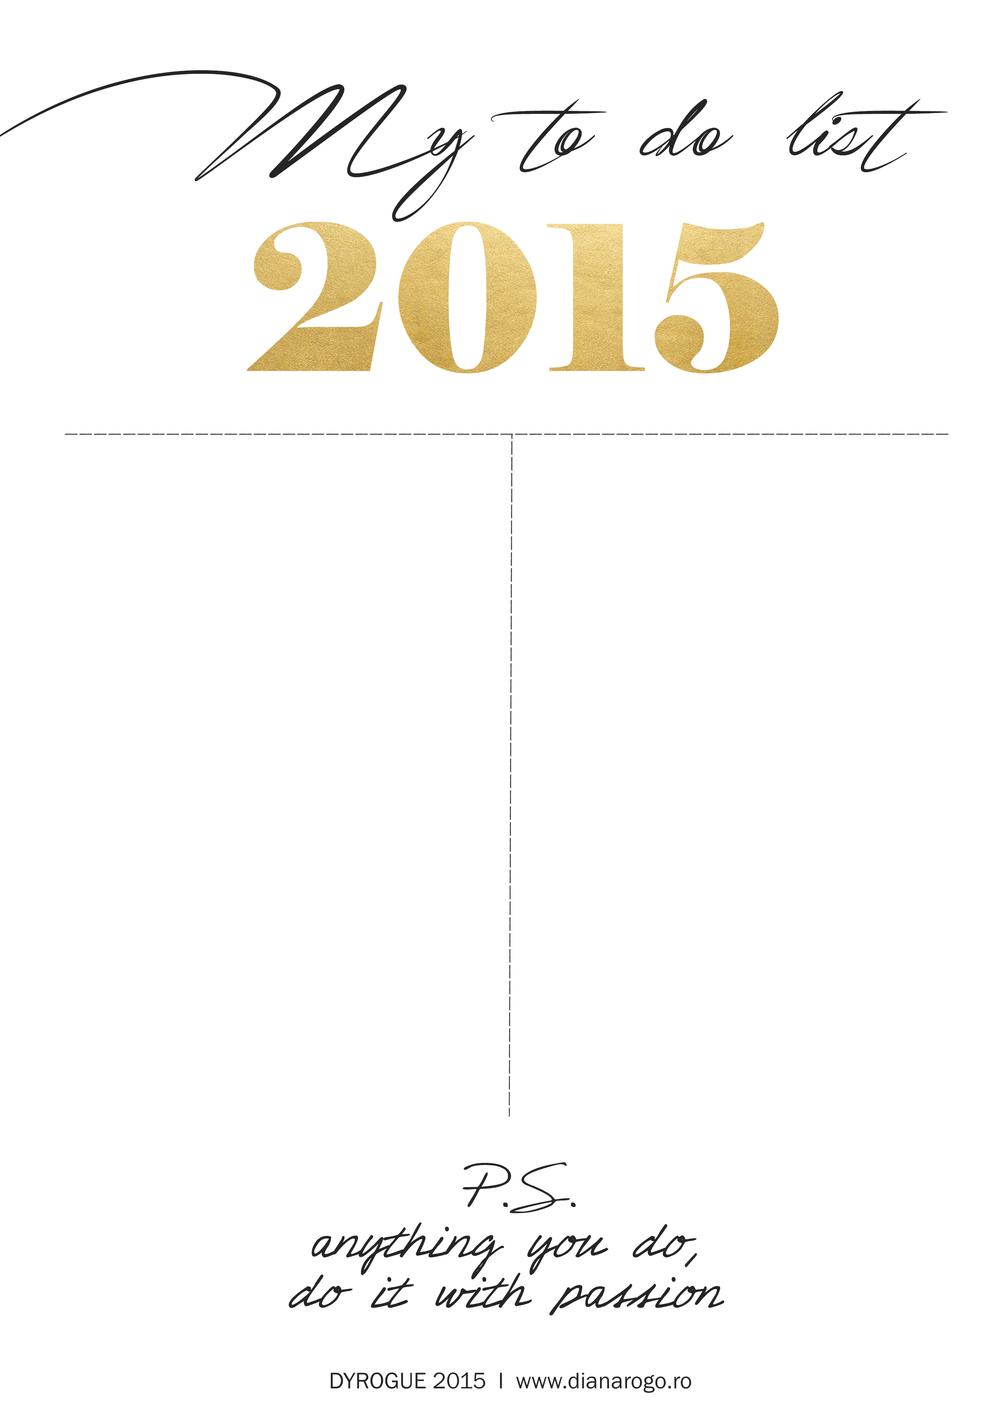 2015 To do Printable on DYROGUE